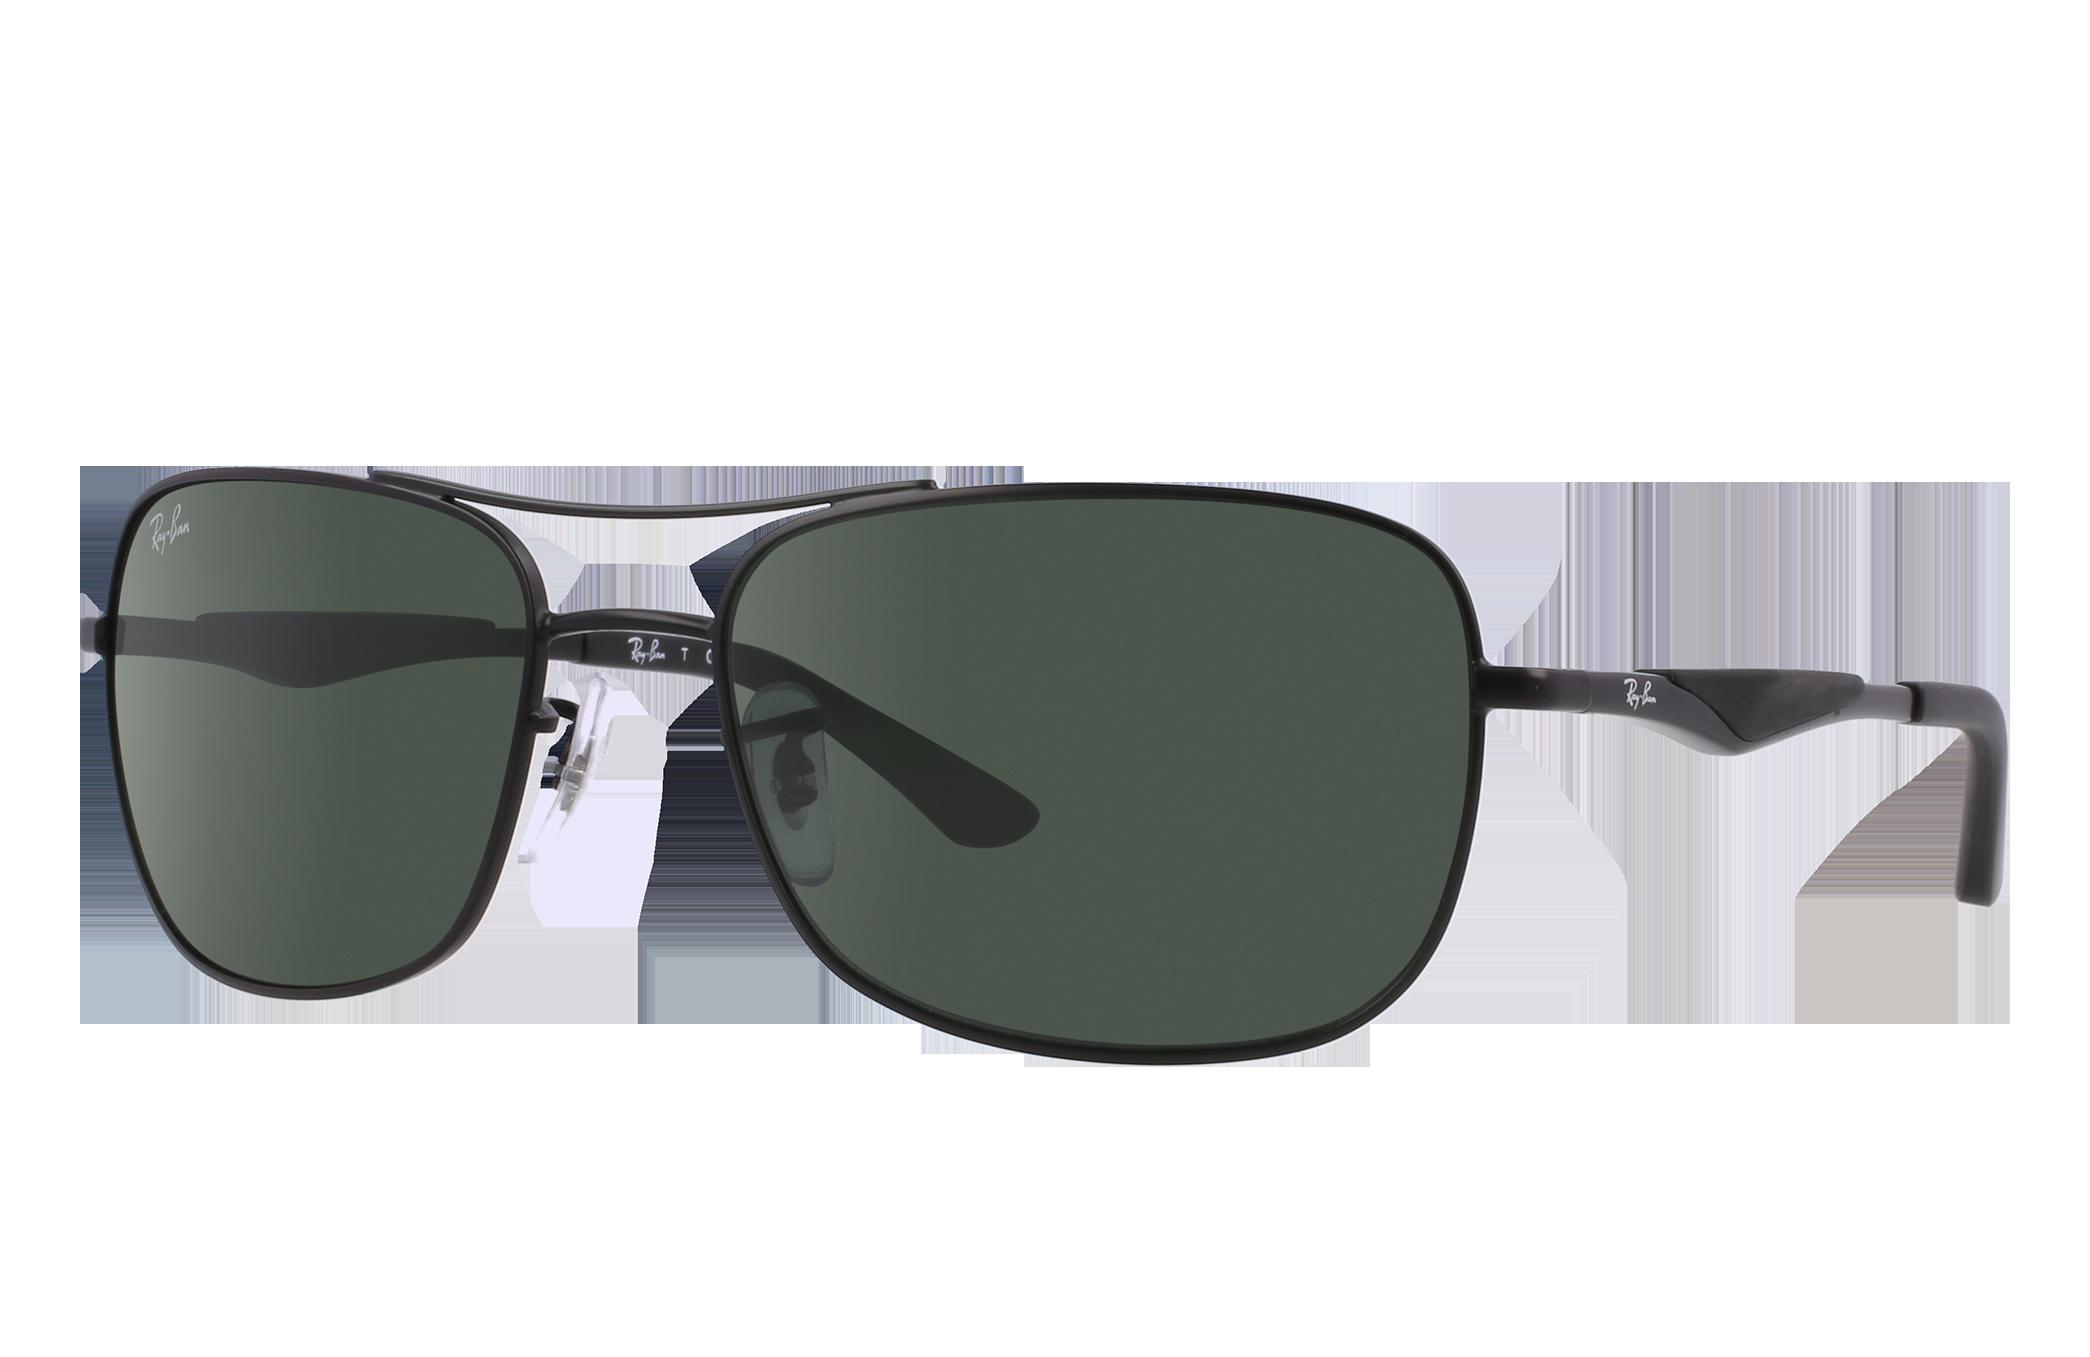 Ray-Ban Rb3515 Black, Green Lenses - RB3515